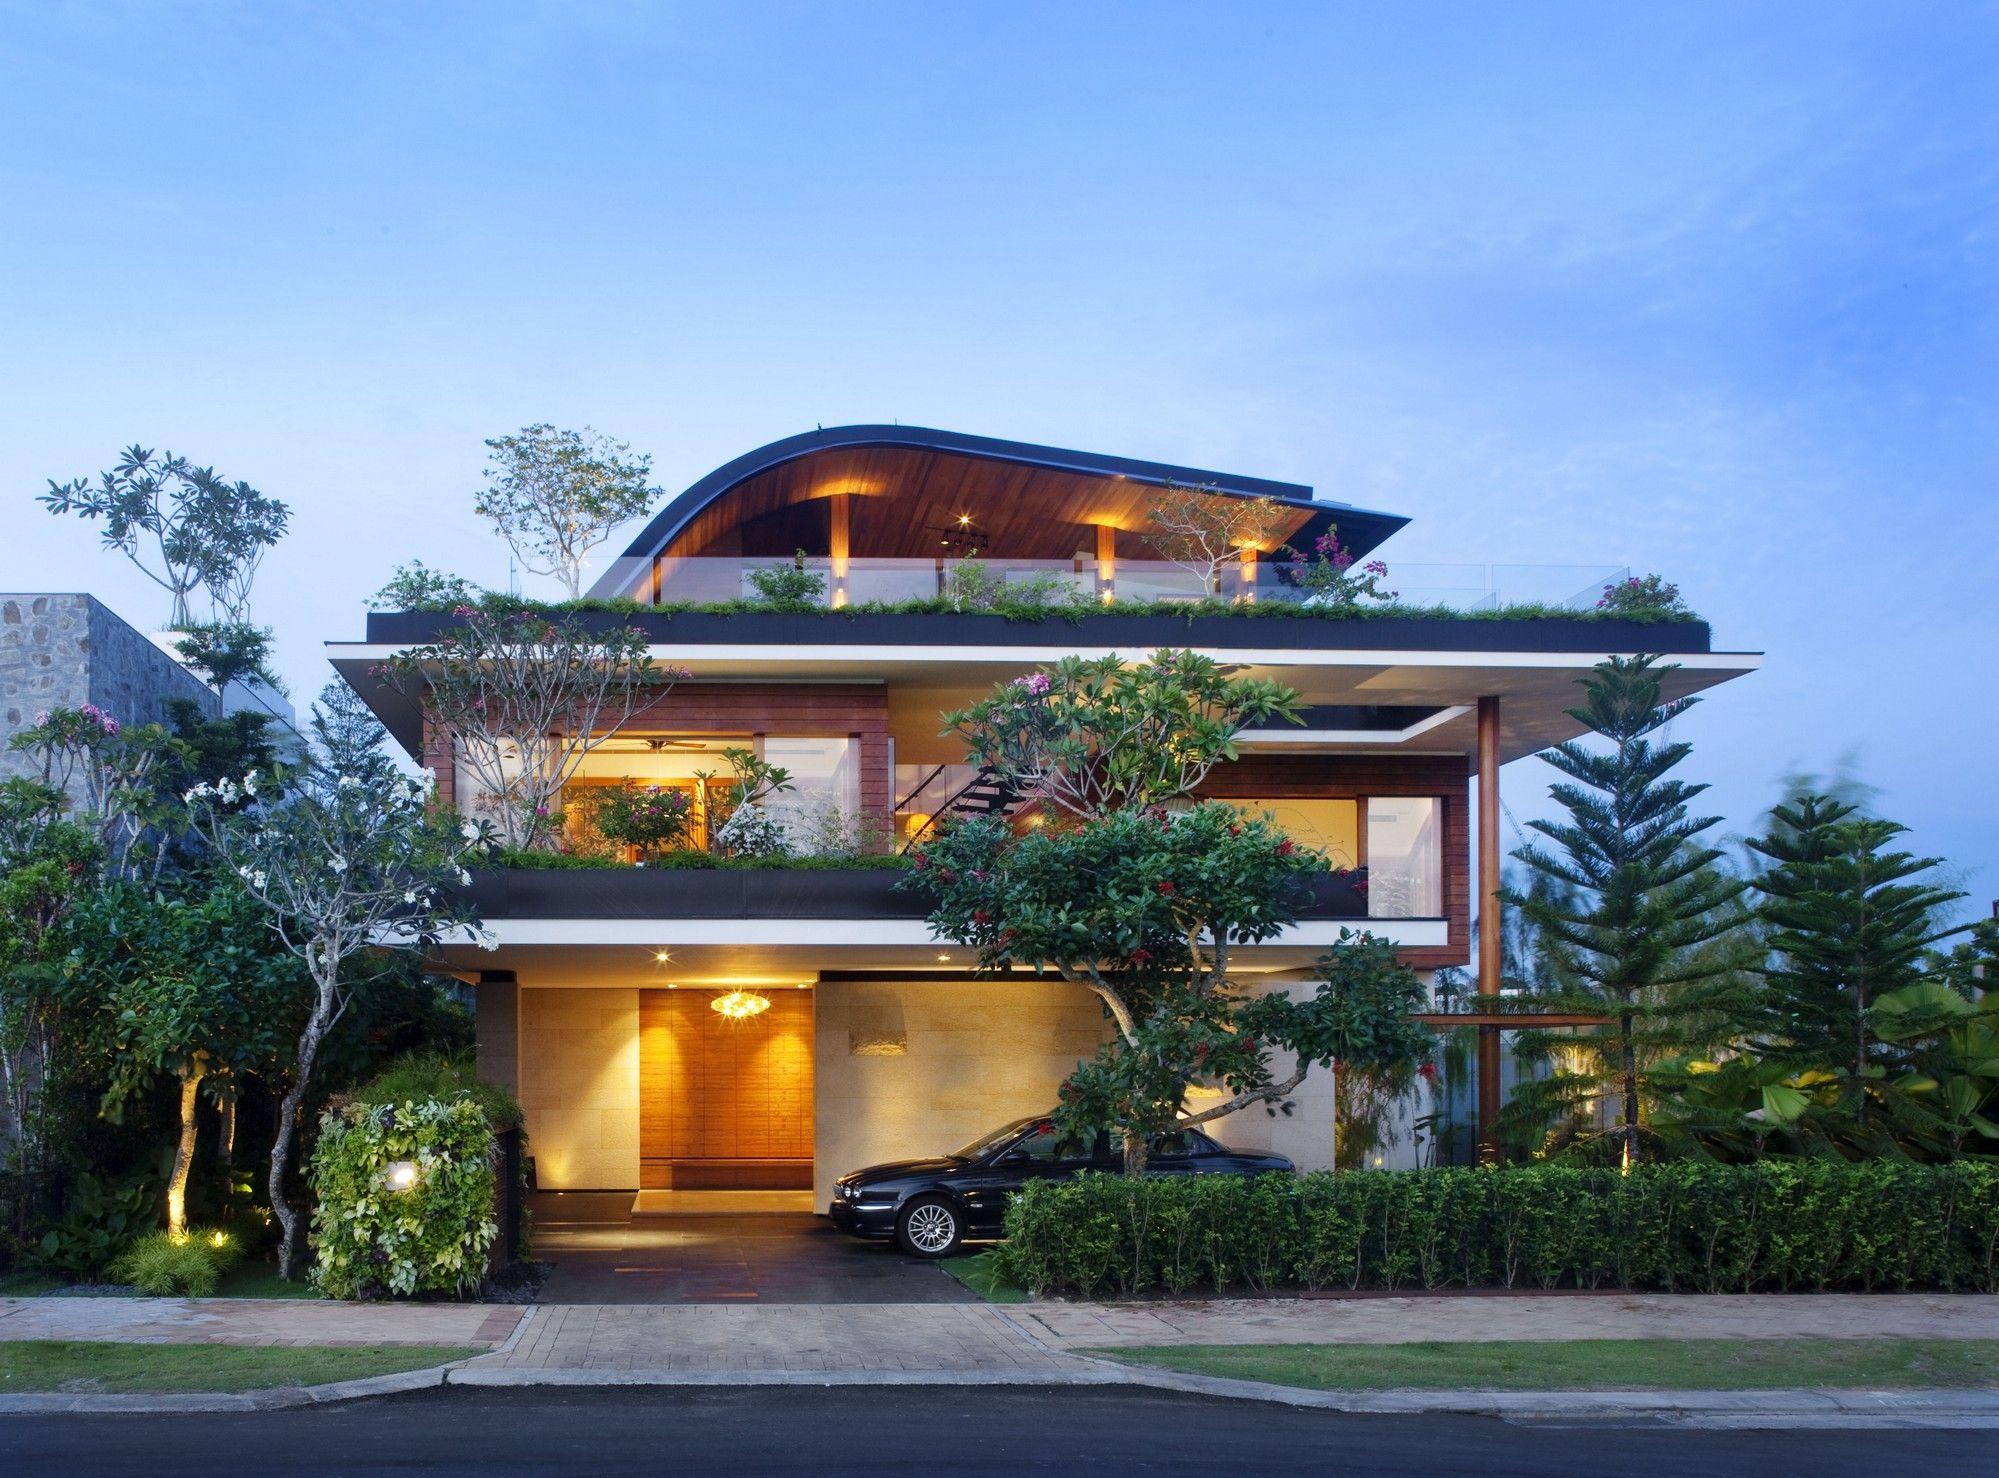 meera house singapore sky garden Guz Architects - Project - SKY GARDEN HOUSE (Meera House